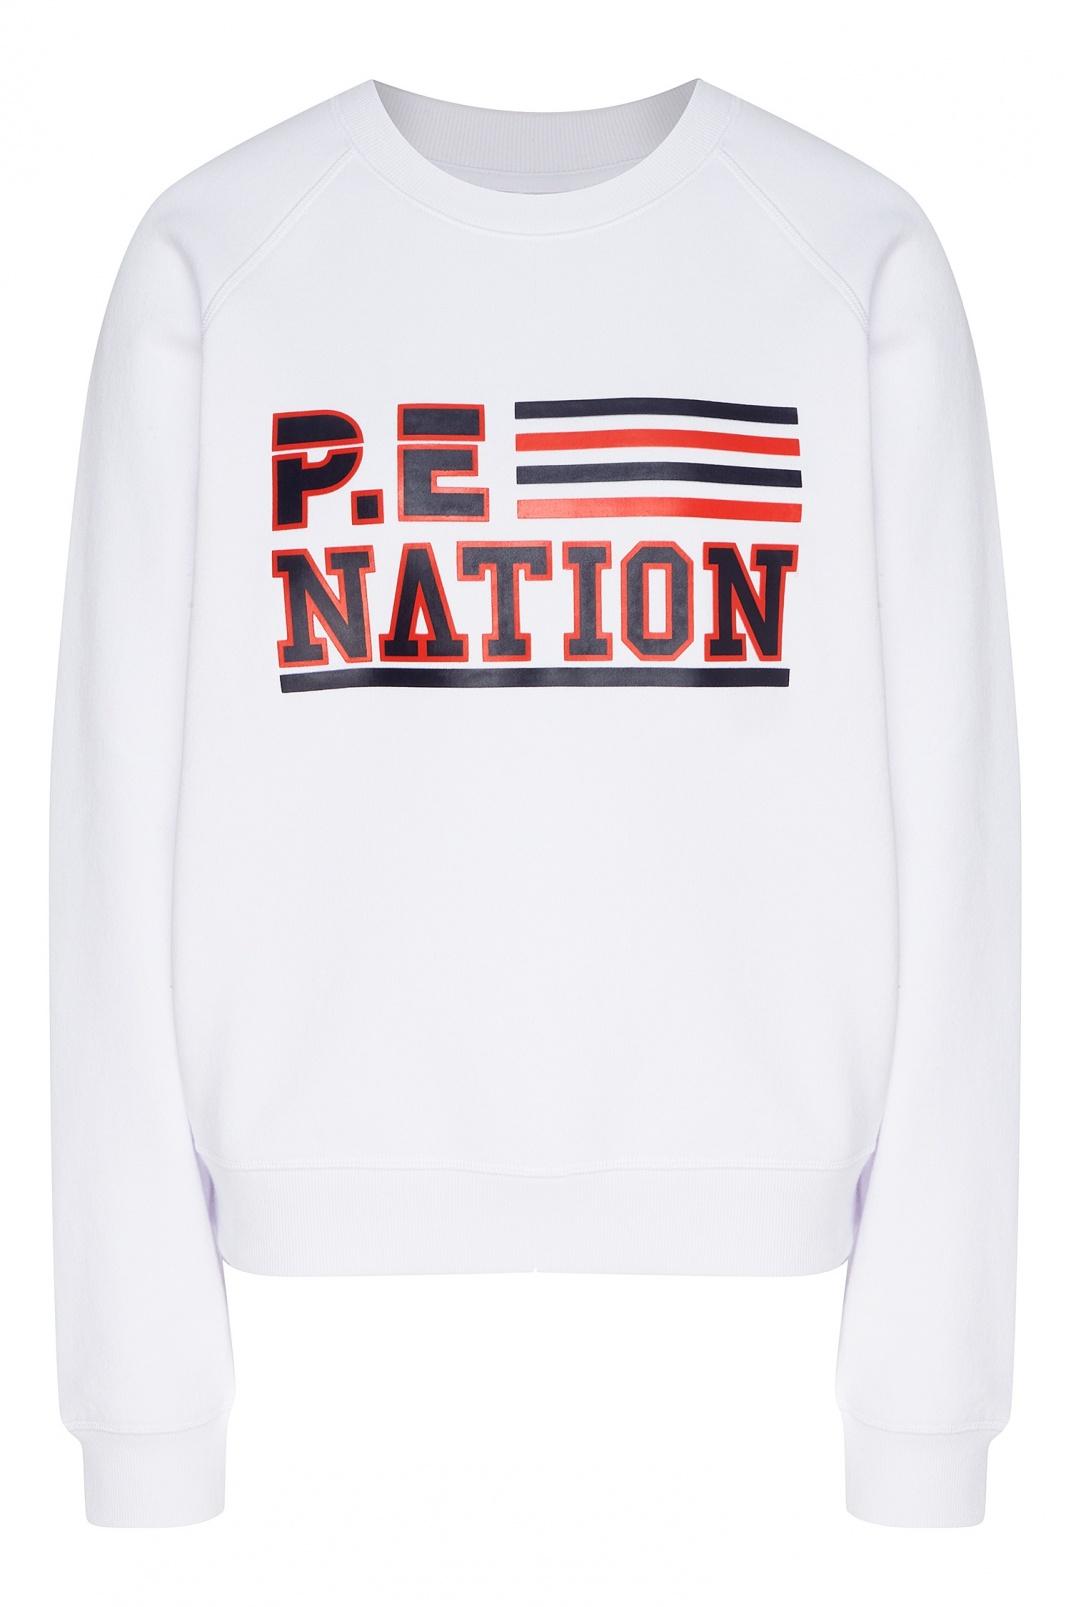 Свитшот P.E NATION  –  Общий вид